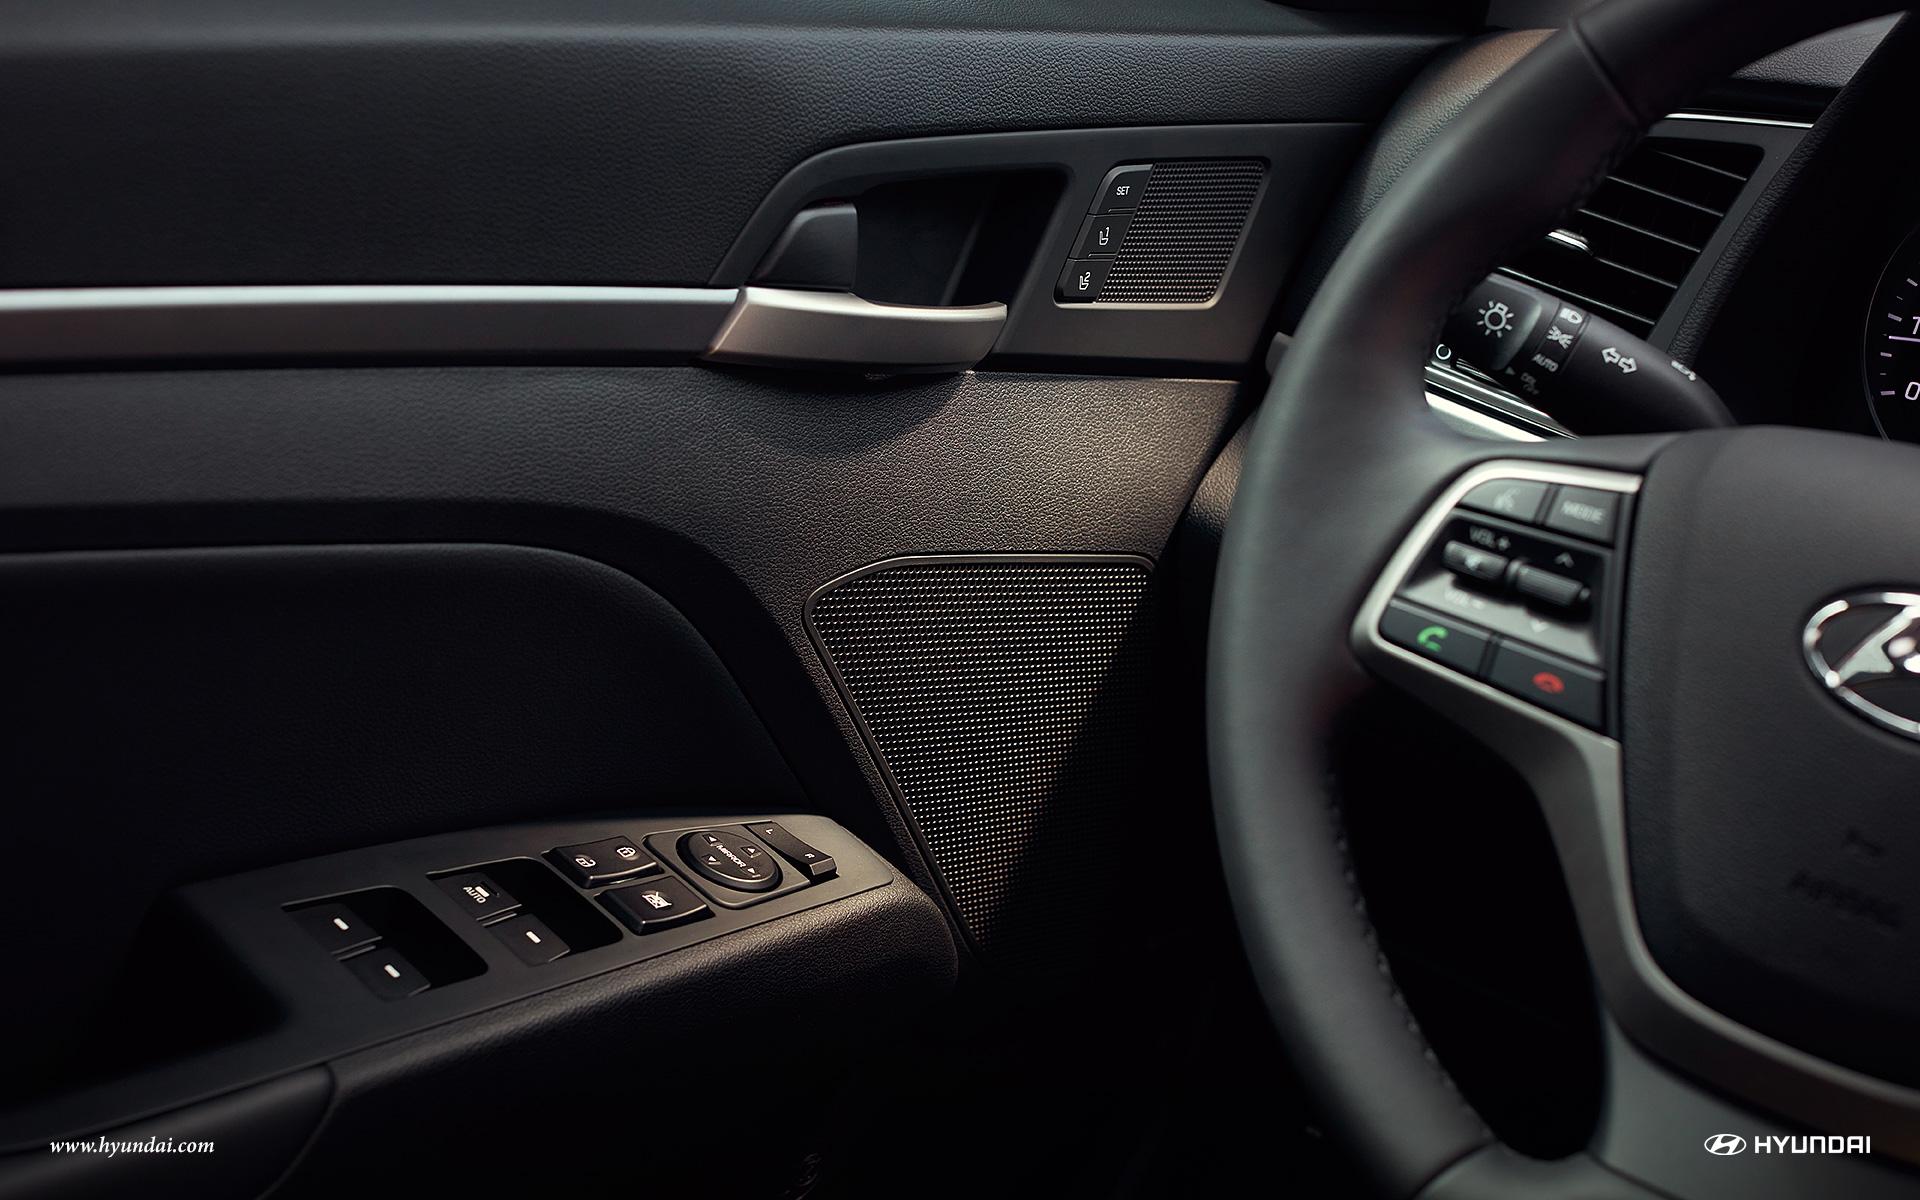 2017 Hyundai Elantra Interior Lightbox